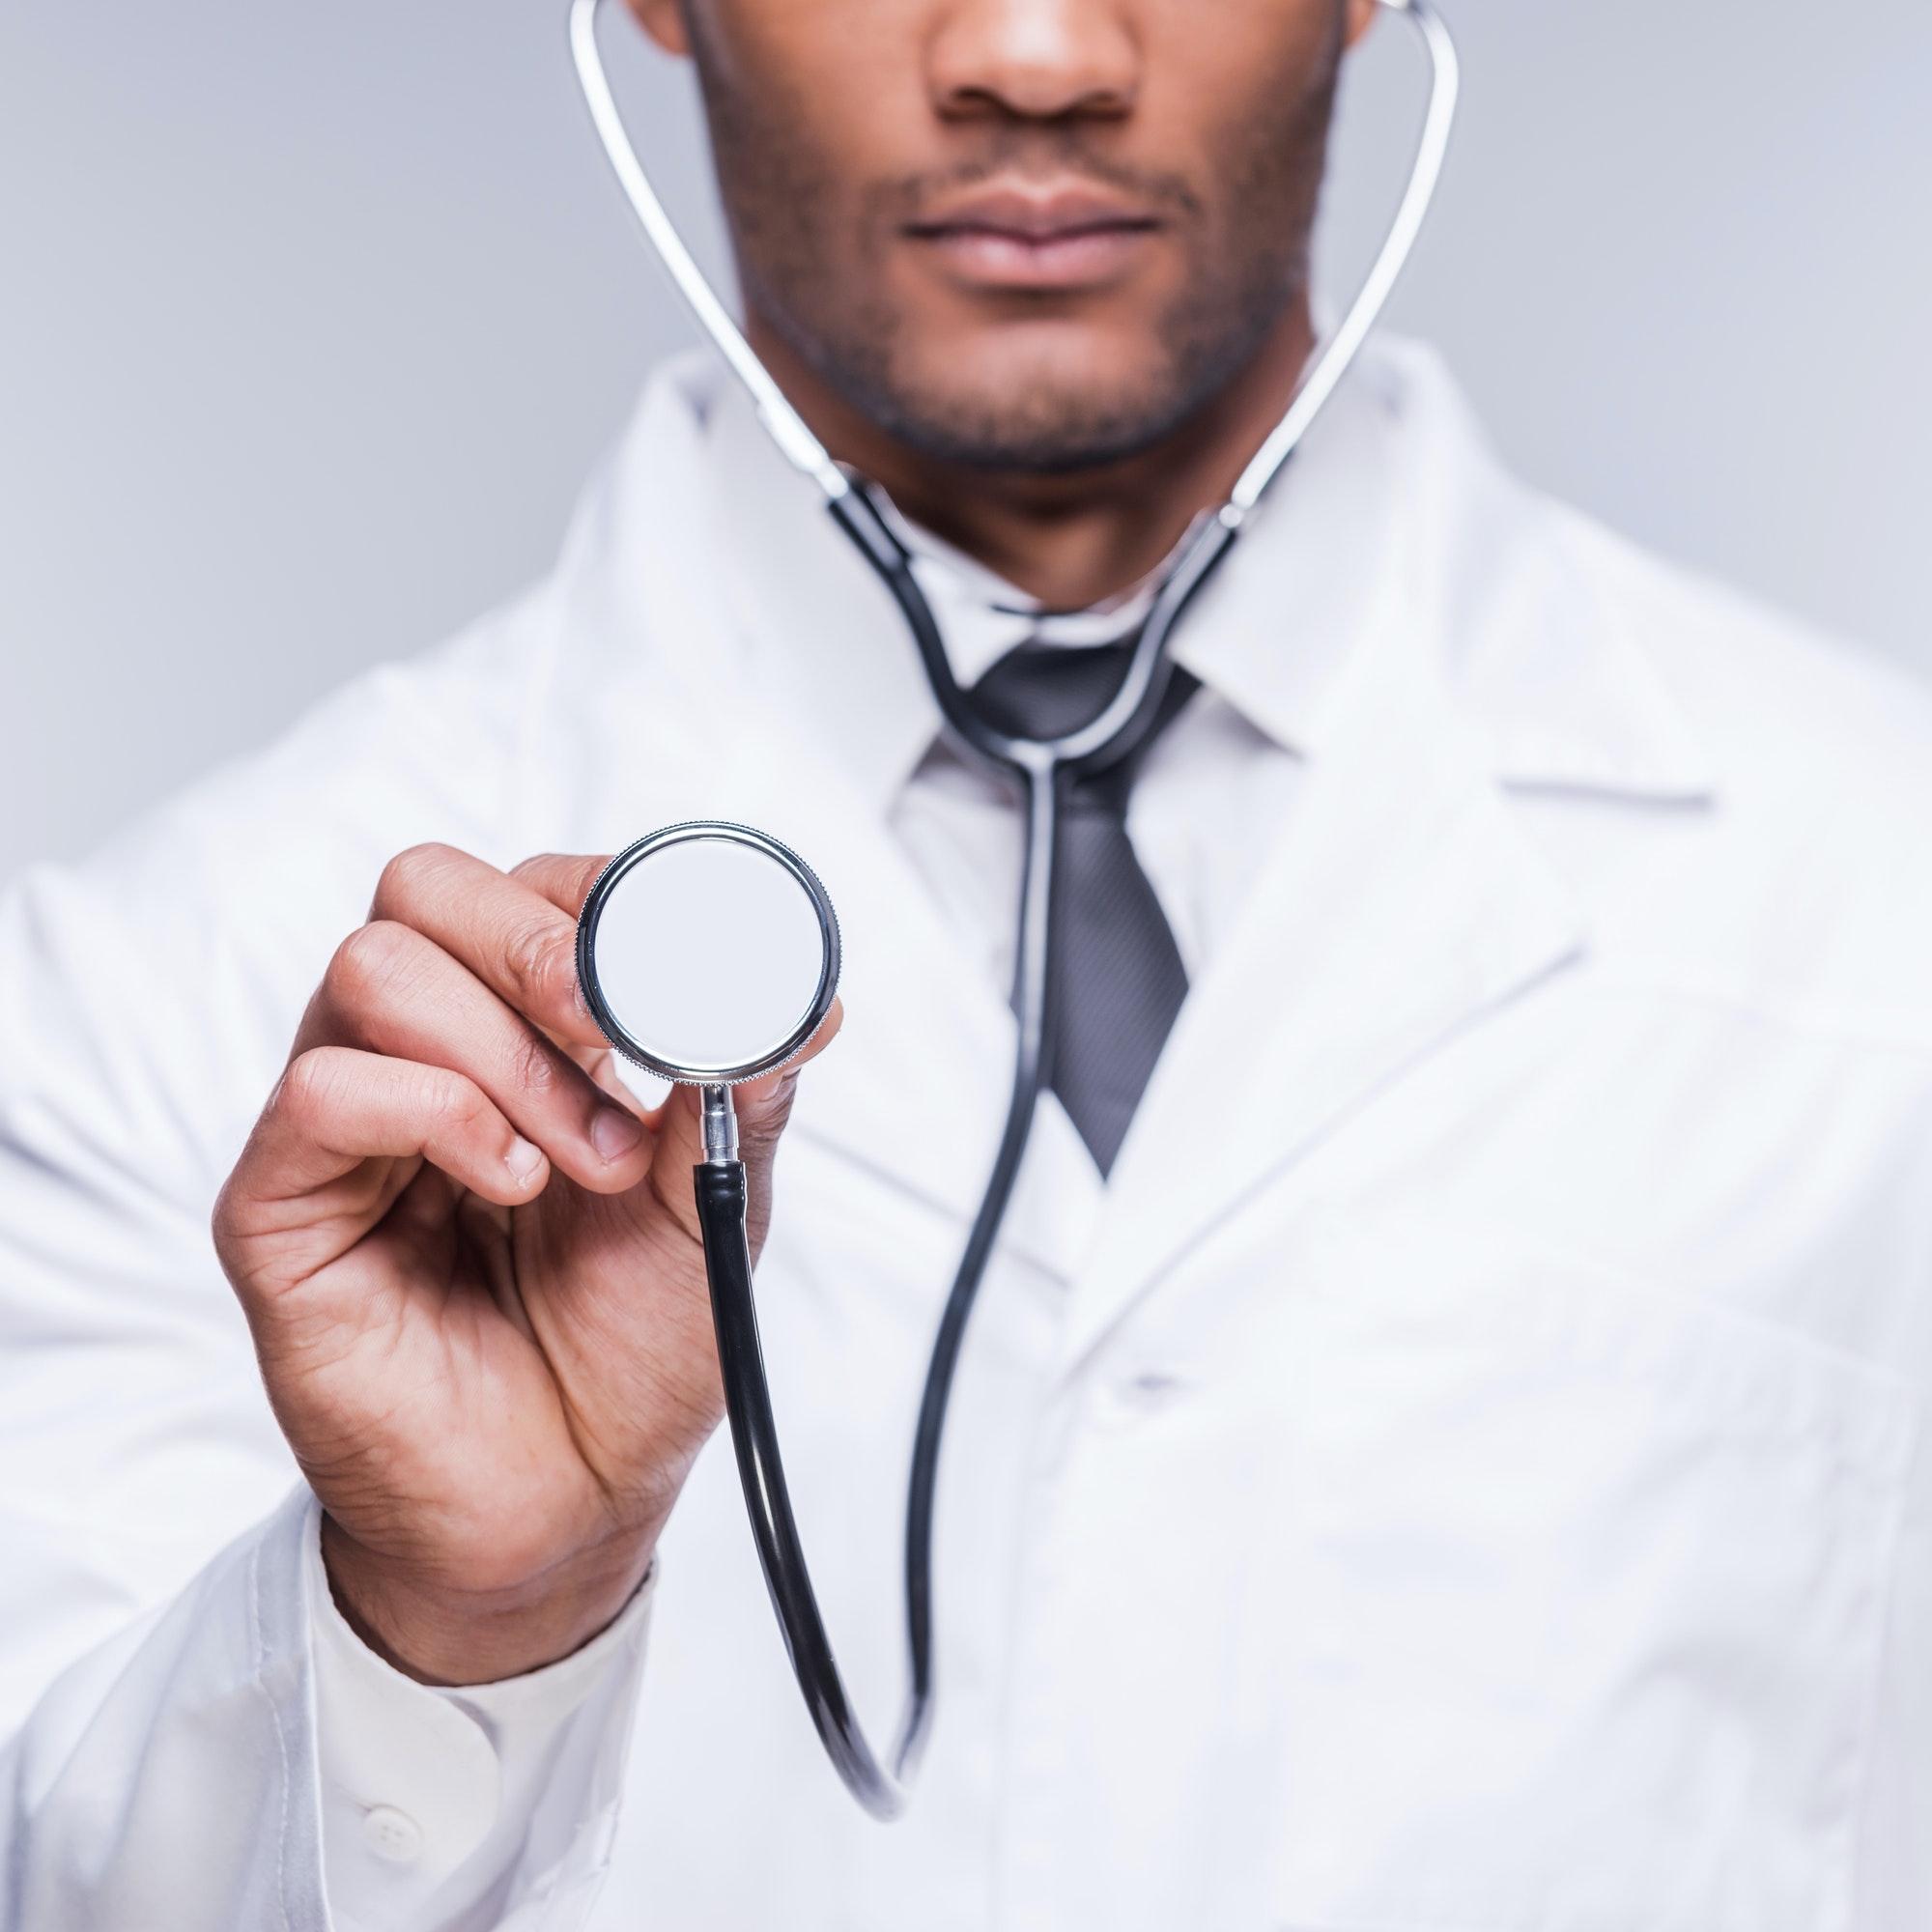 100 Medical English phrasal verbs